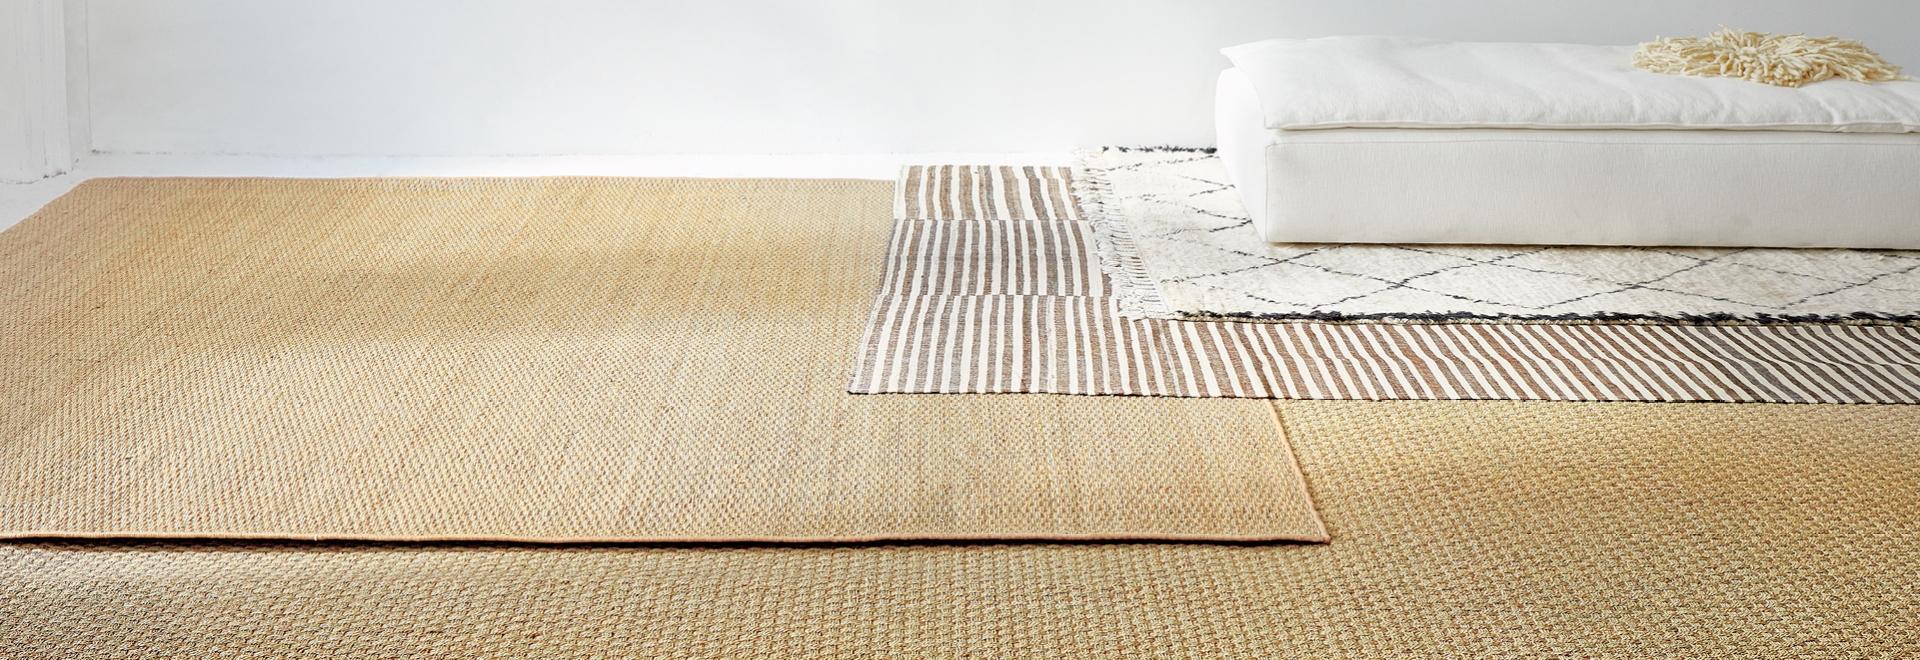 Jute Sisal Rugs Natural Fiber Rugs At Abc Carpet Inside Sissel Rugs (Image 11 of 15)